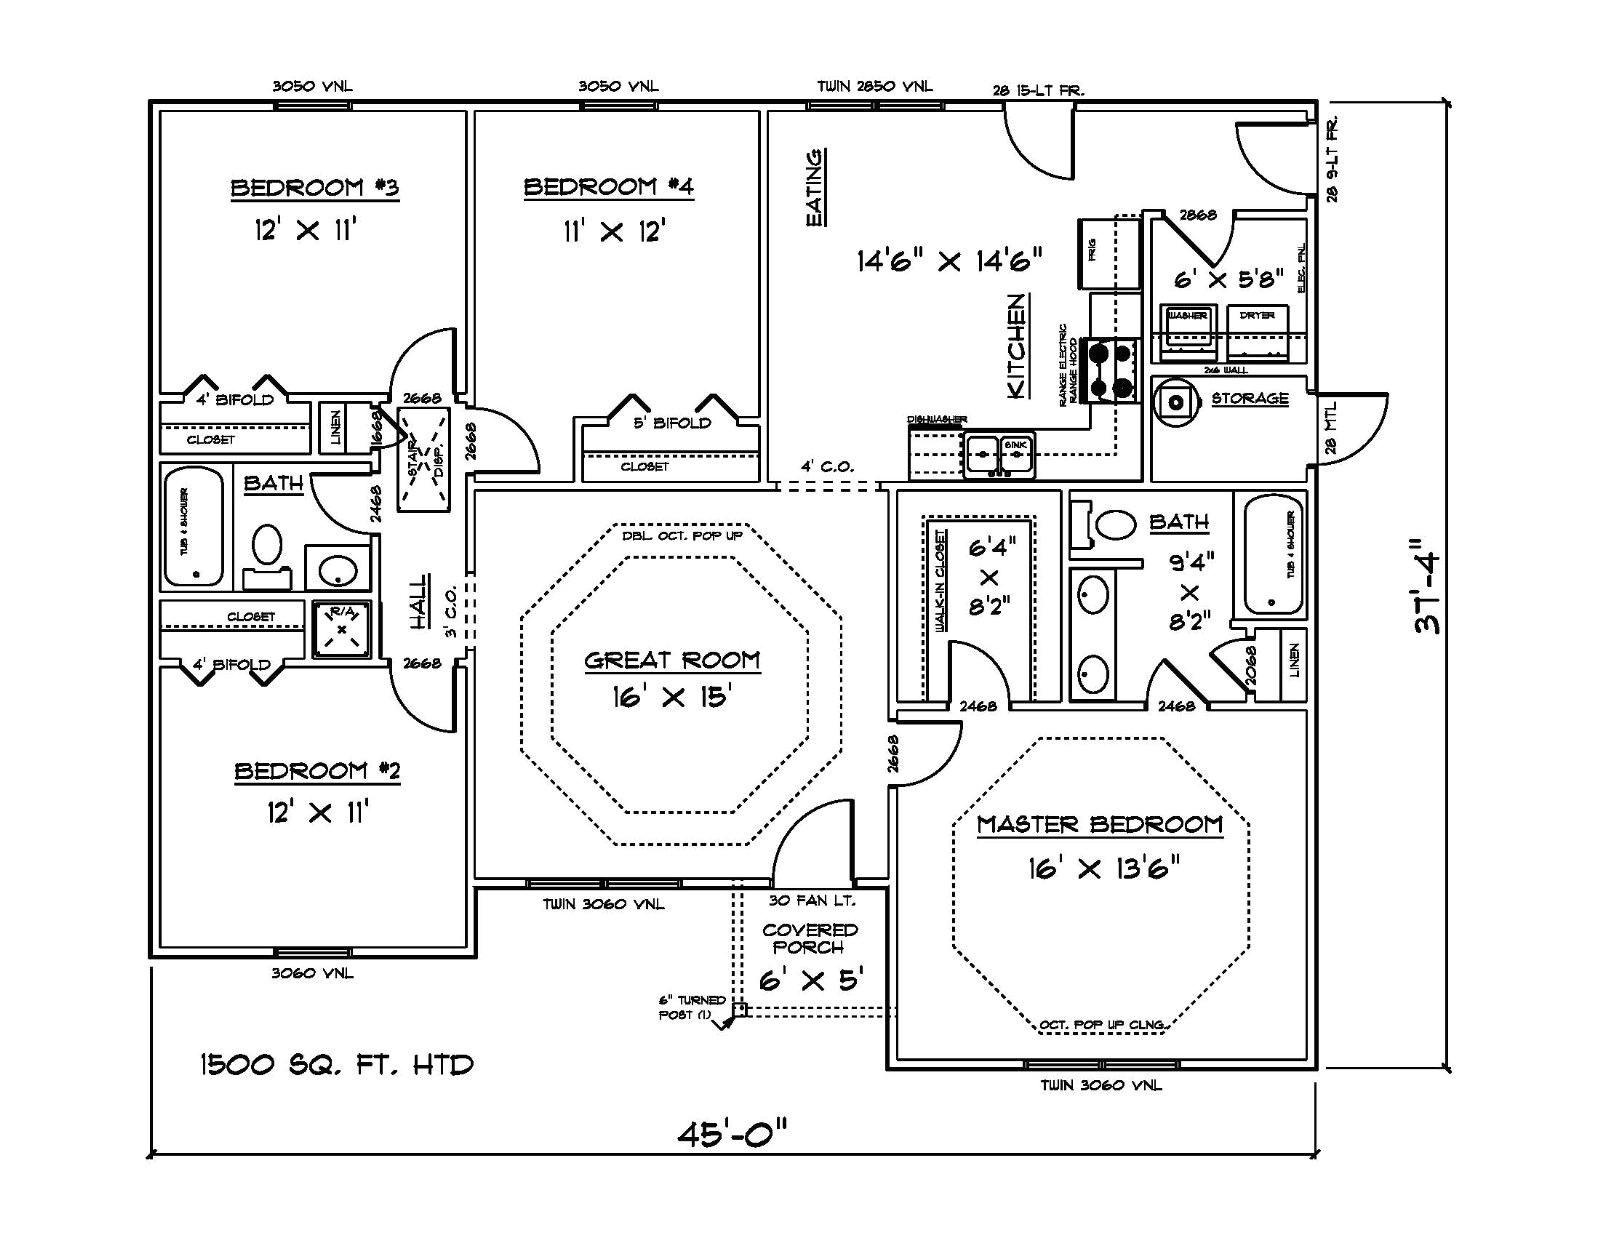 25 simple 1500 sq ft house design ideas photo